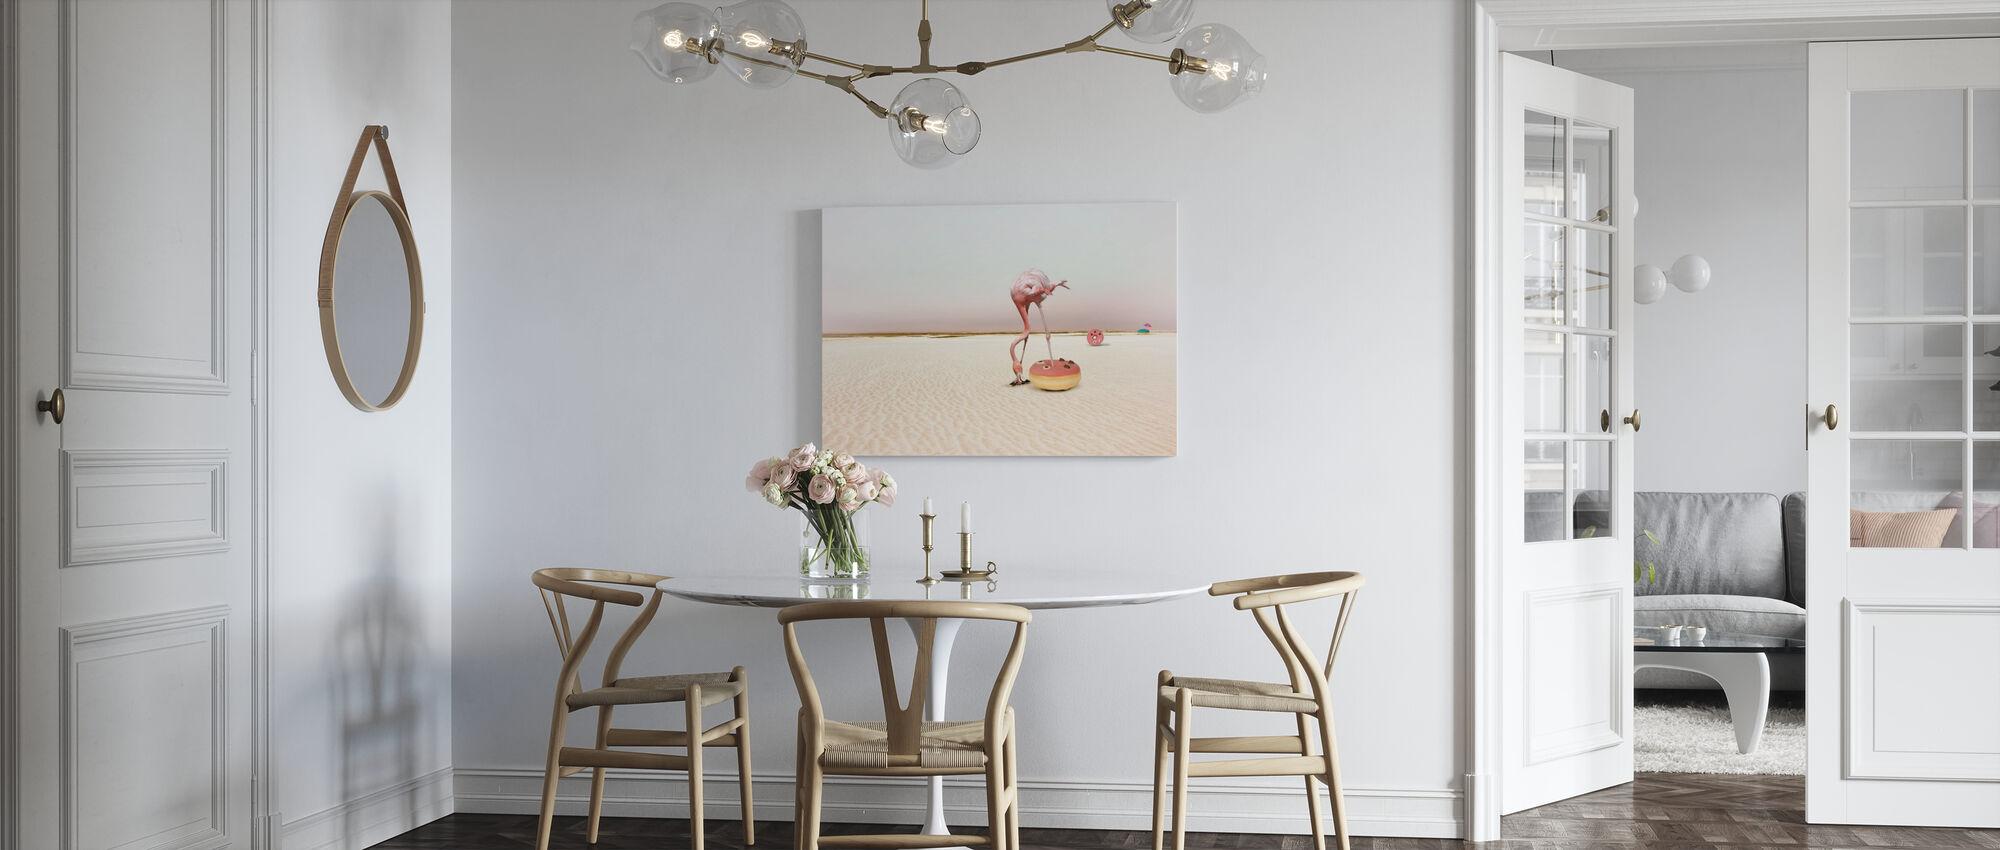 Donut Strand - Canvastavla - Kök